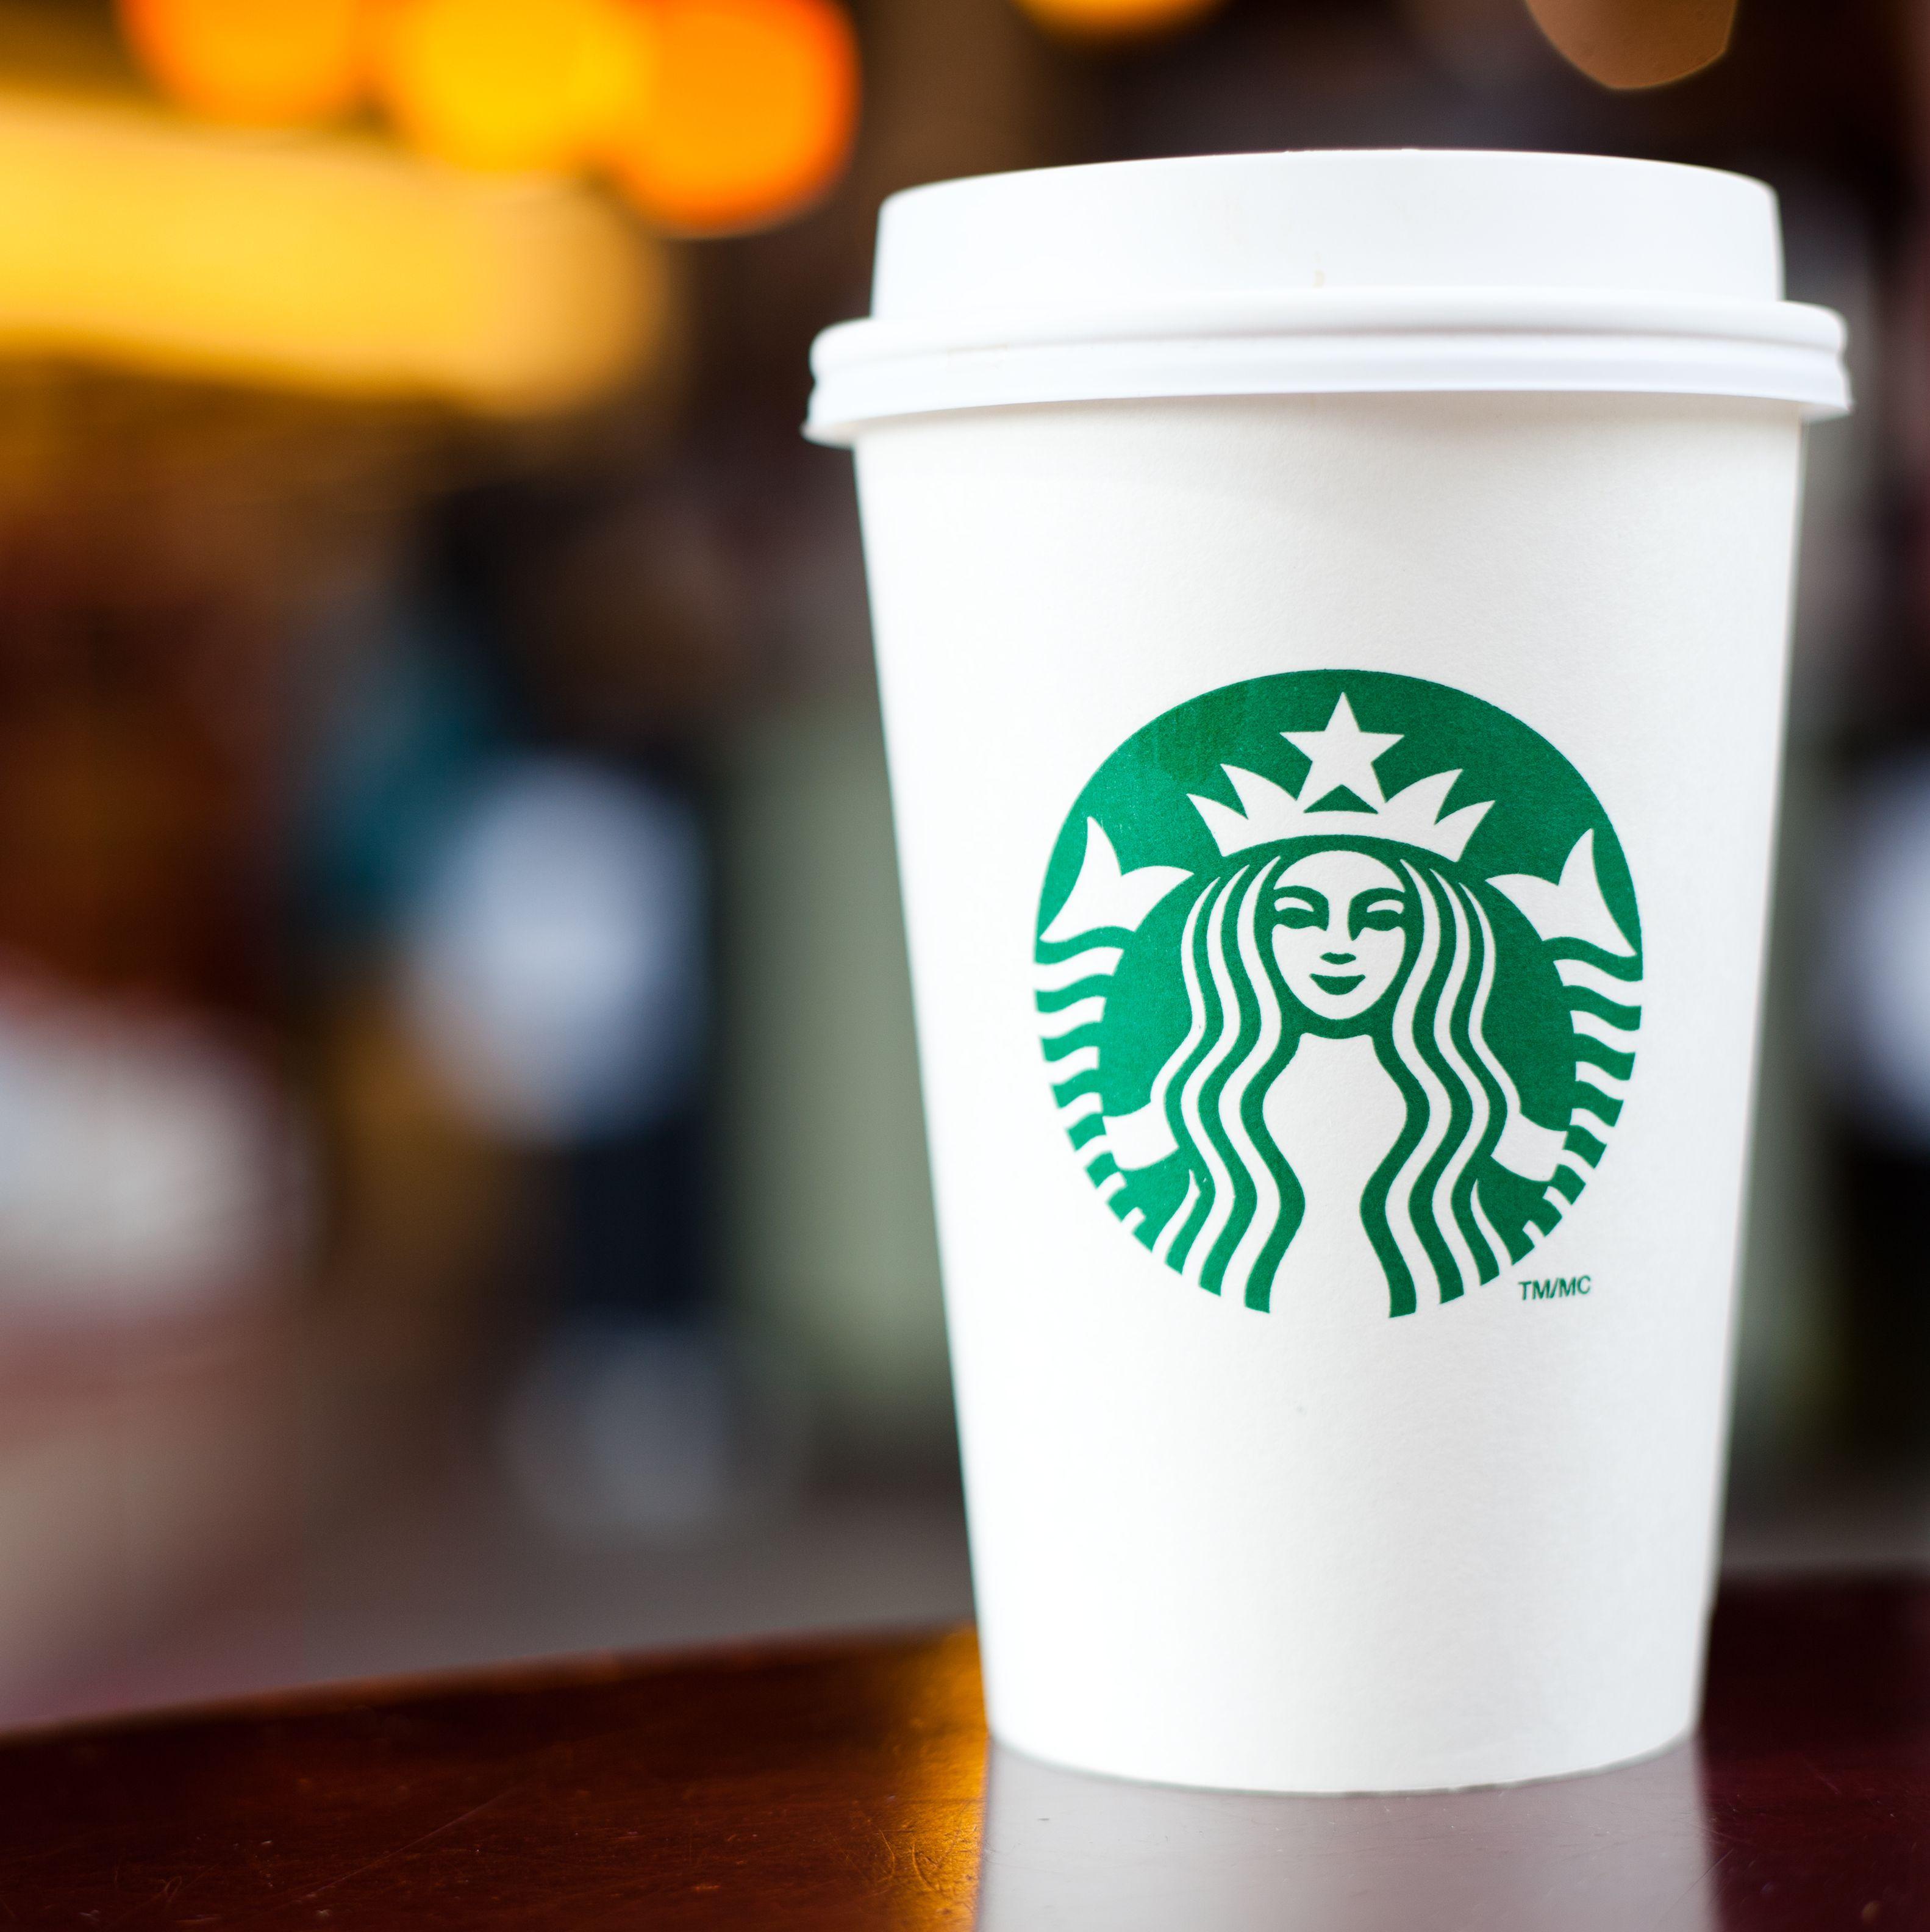 7 Healthy Starbucks Drinks That Aren't Total Sugar Bombs